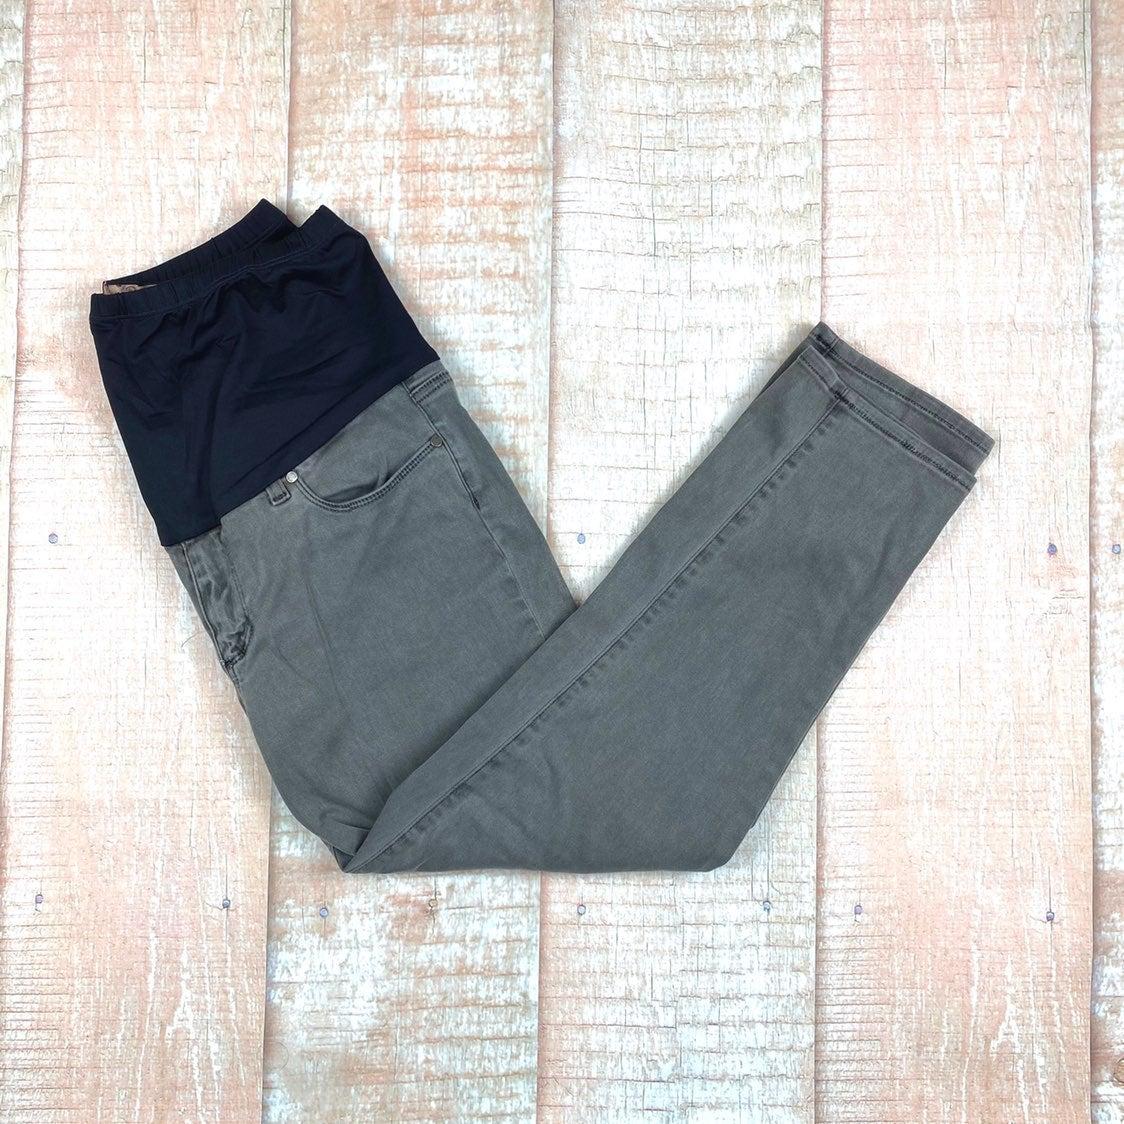 Paige Denim Maternity Jeans- Gray